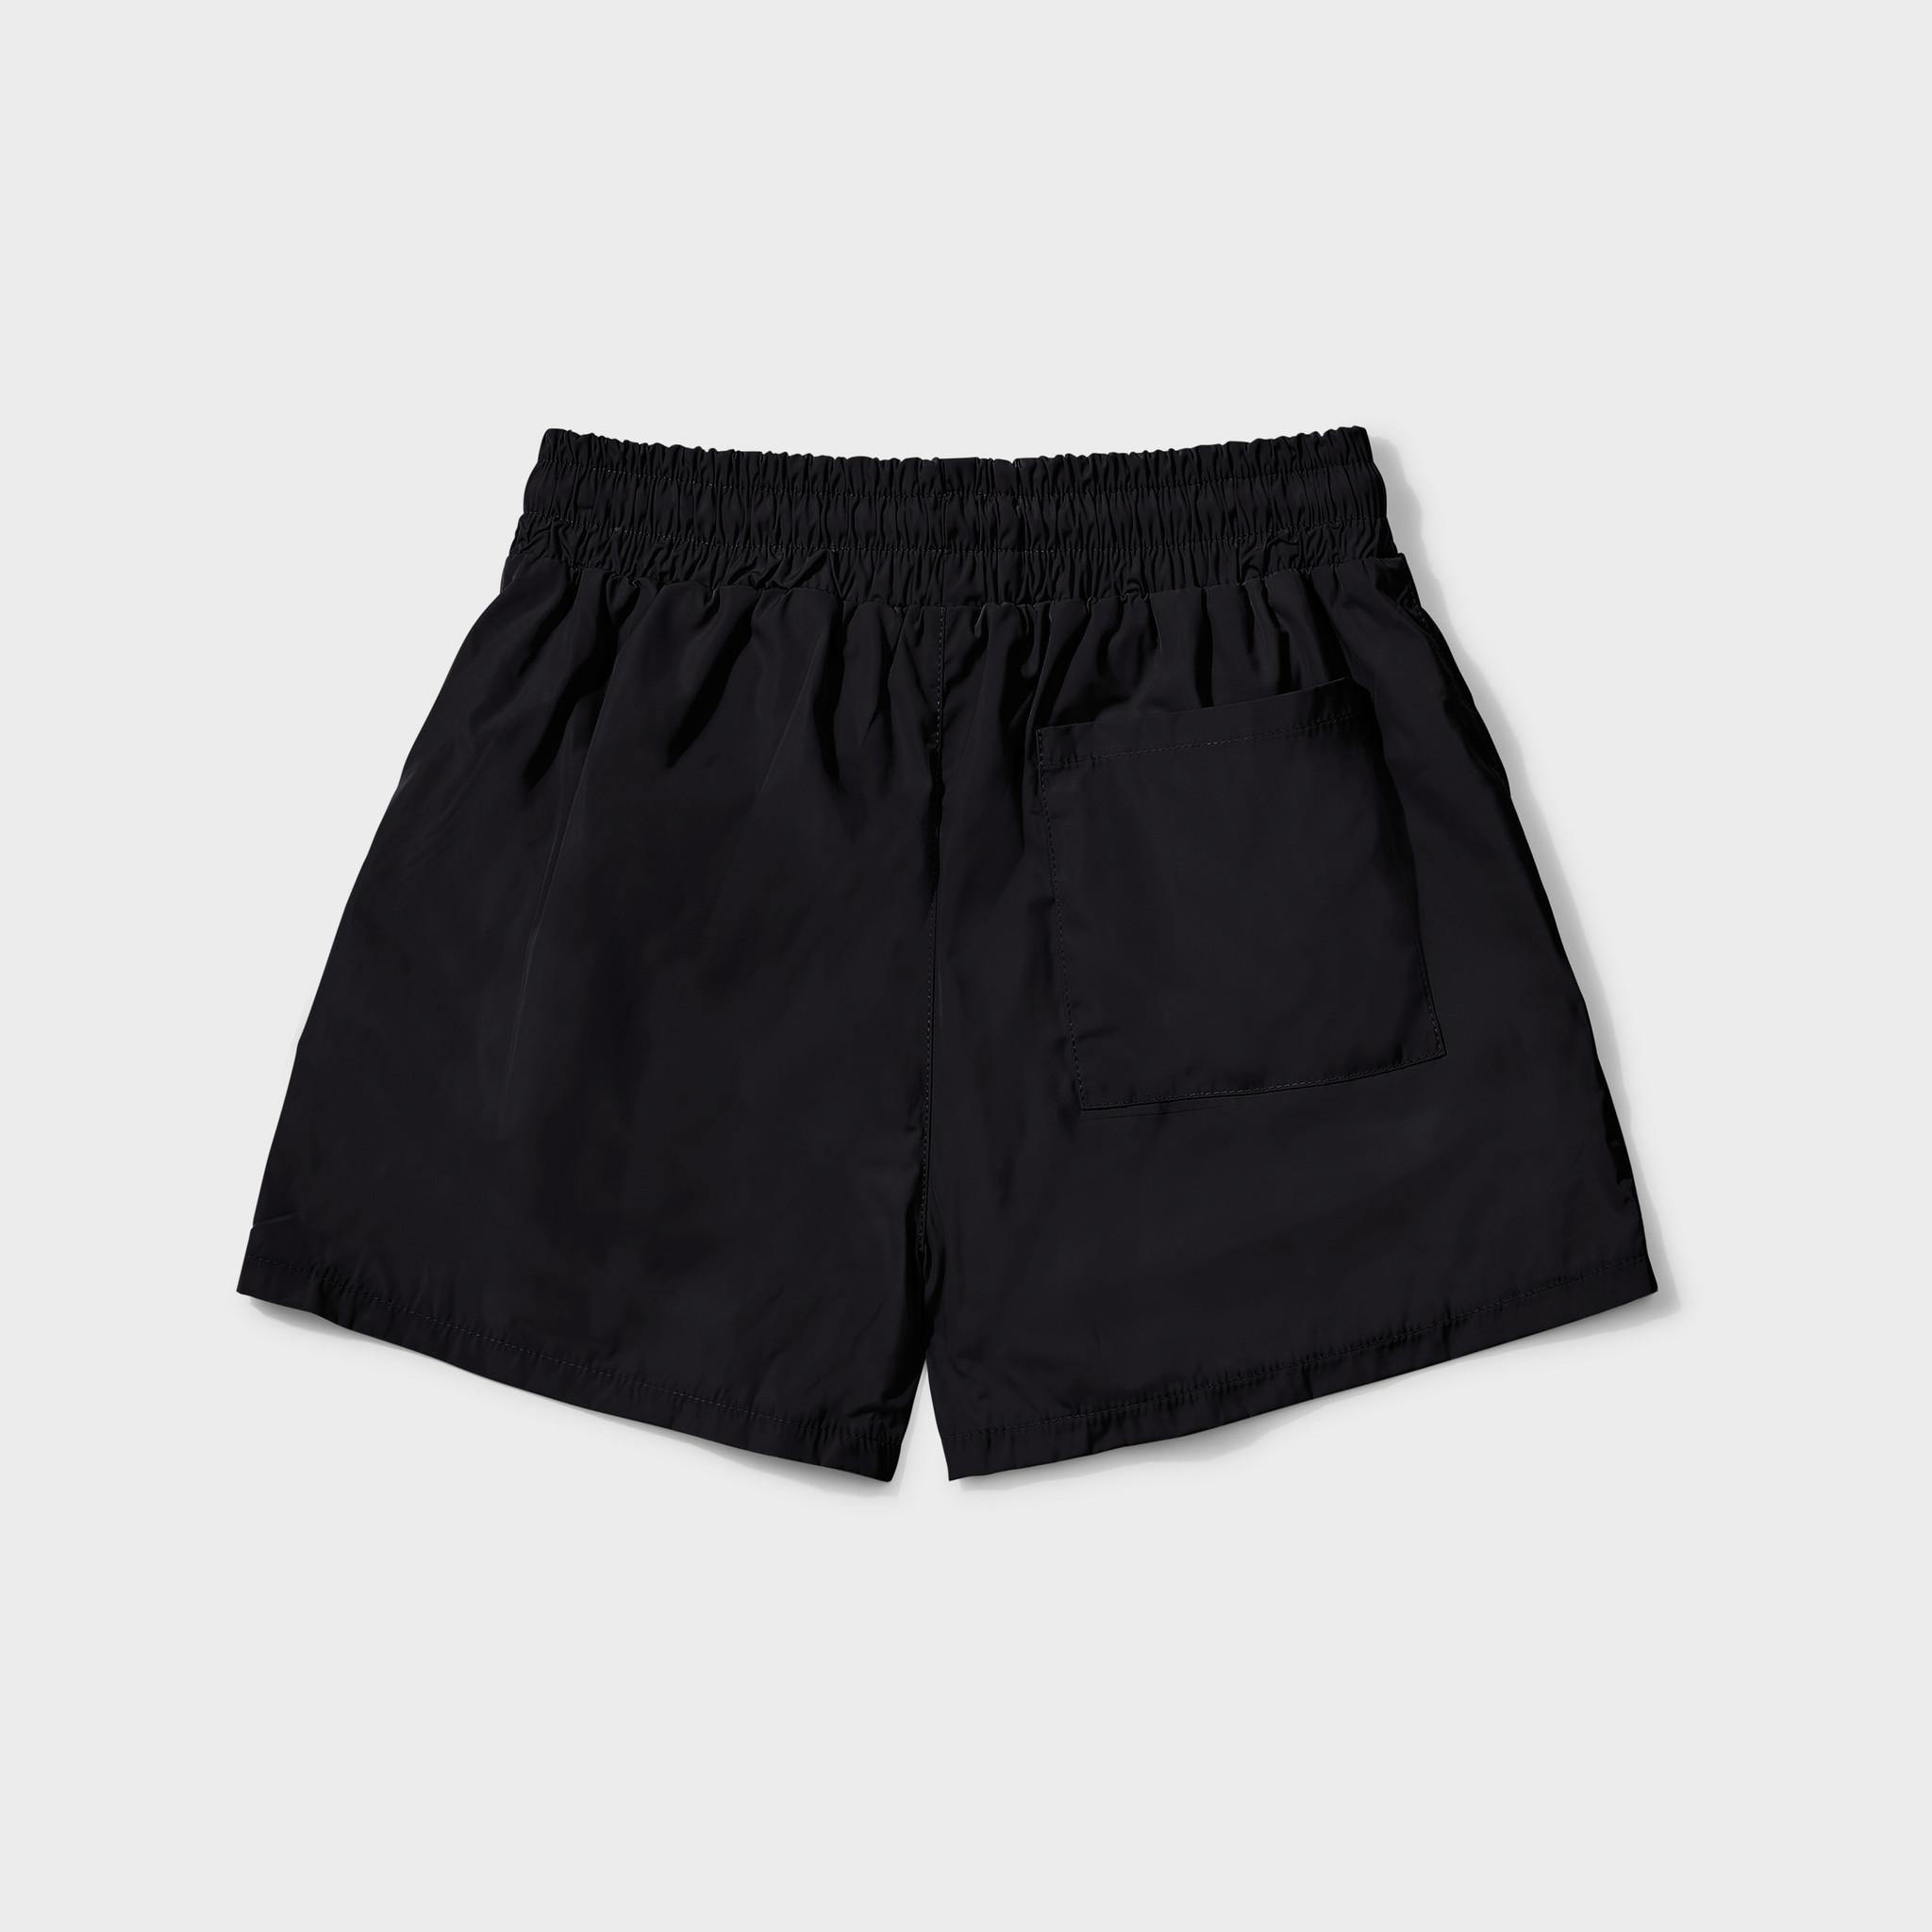 Amir swim shorts black-2